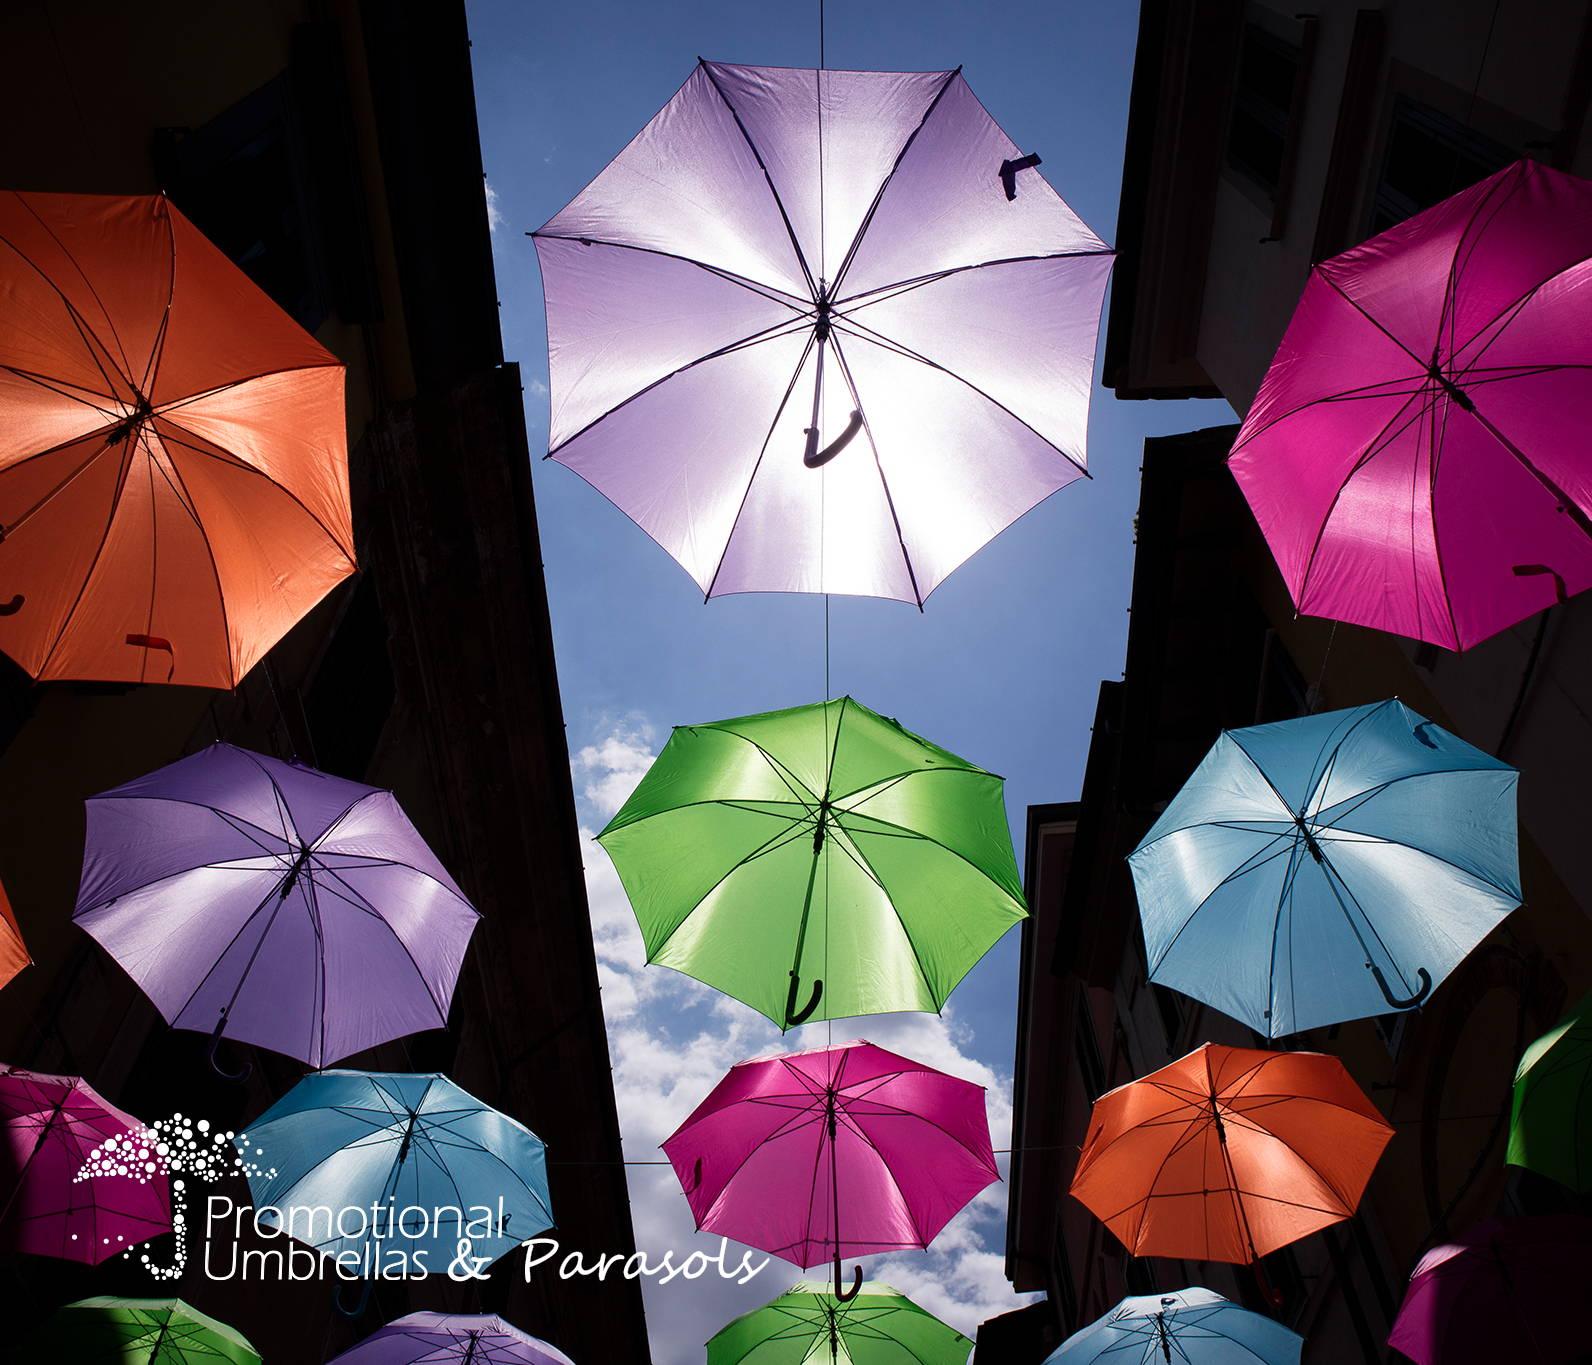 promotional umbrellas at the umbrella festival